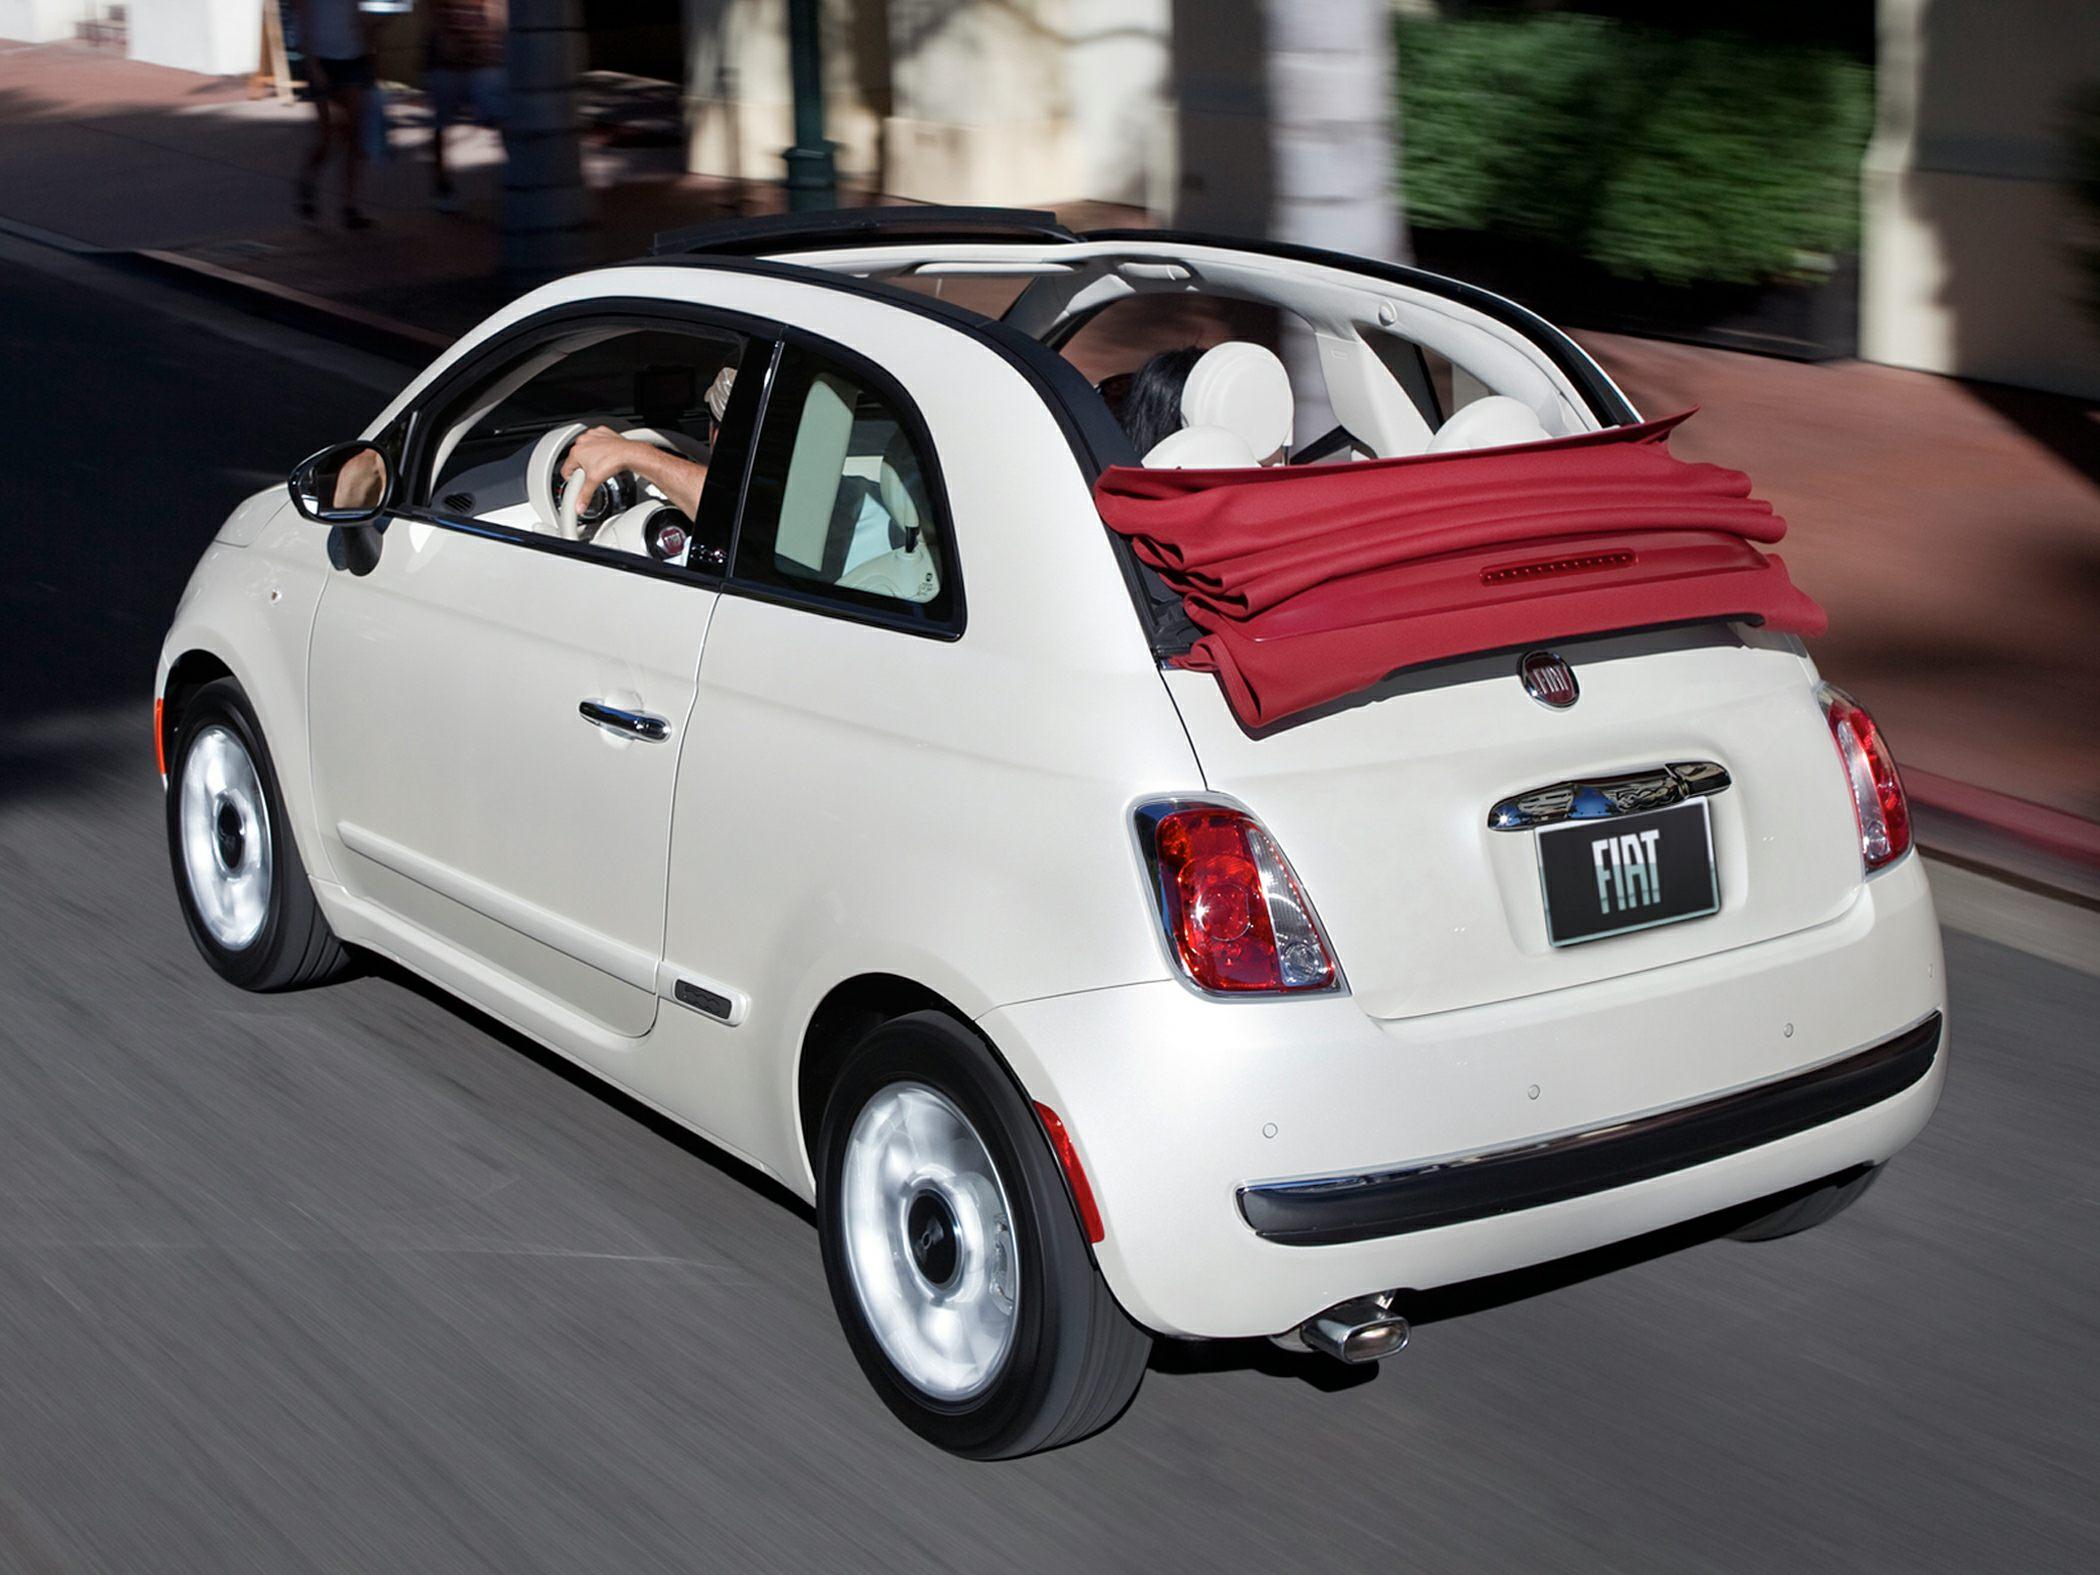 silver car fiat deals electric lease leasing